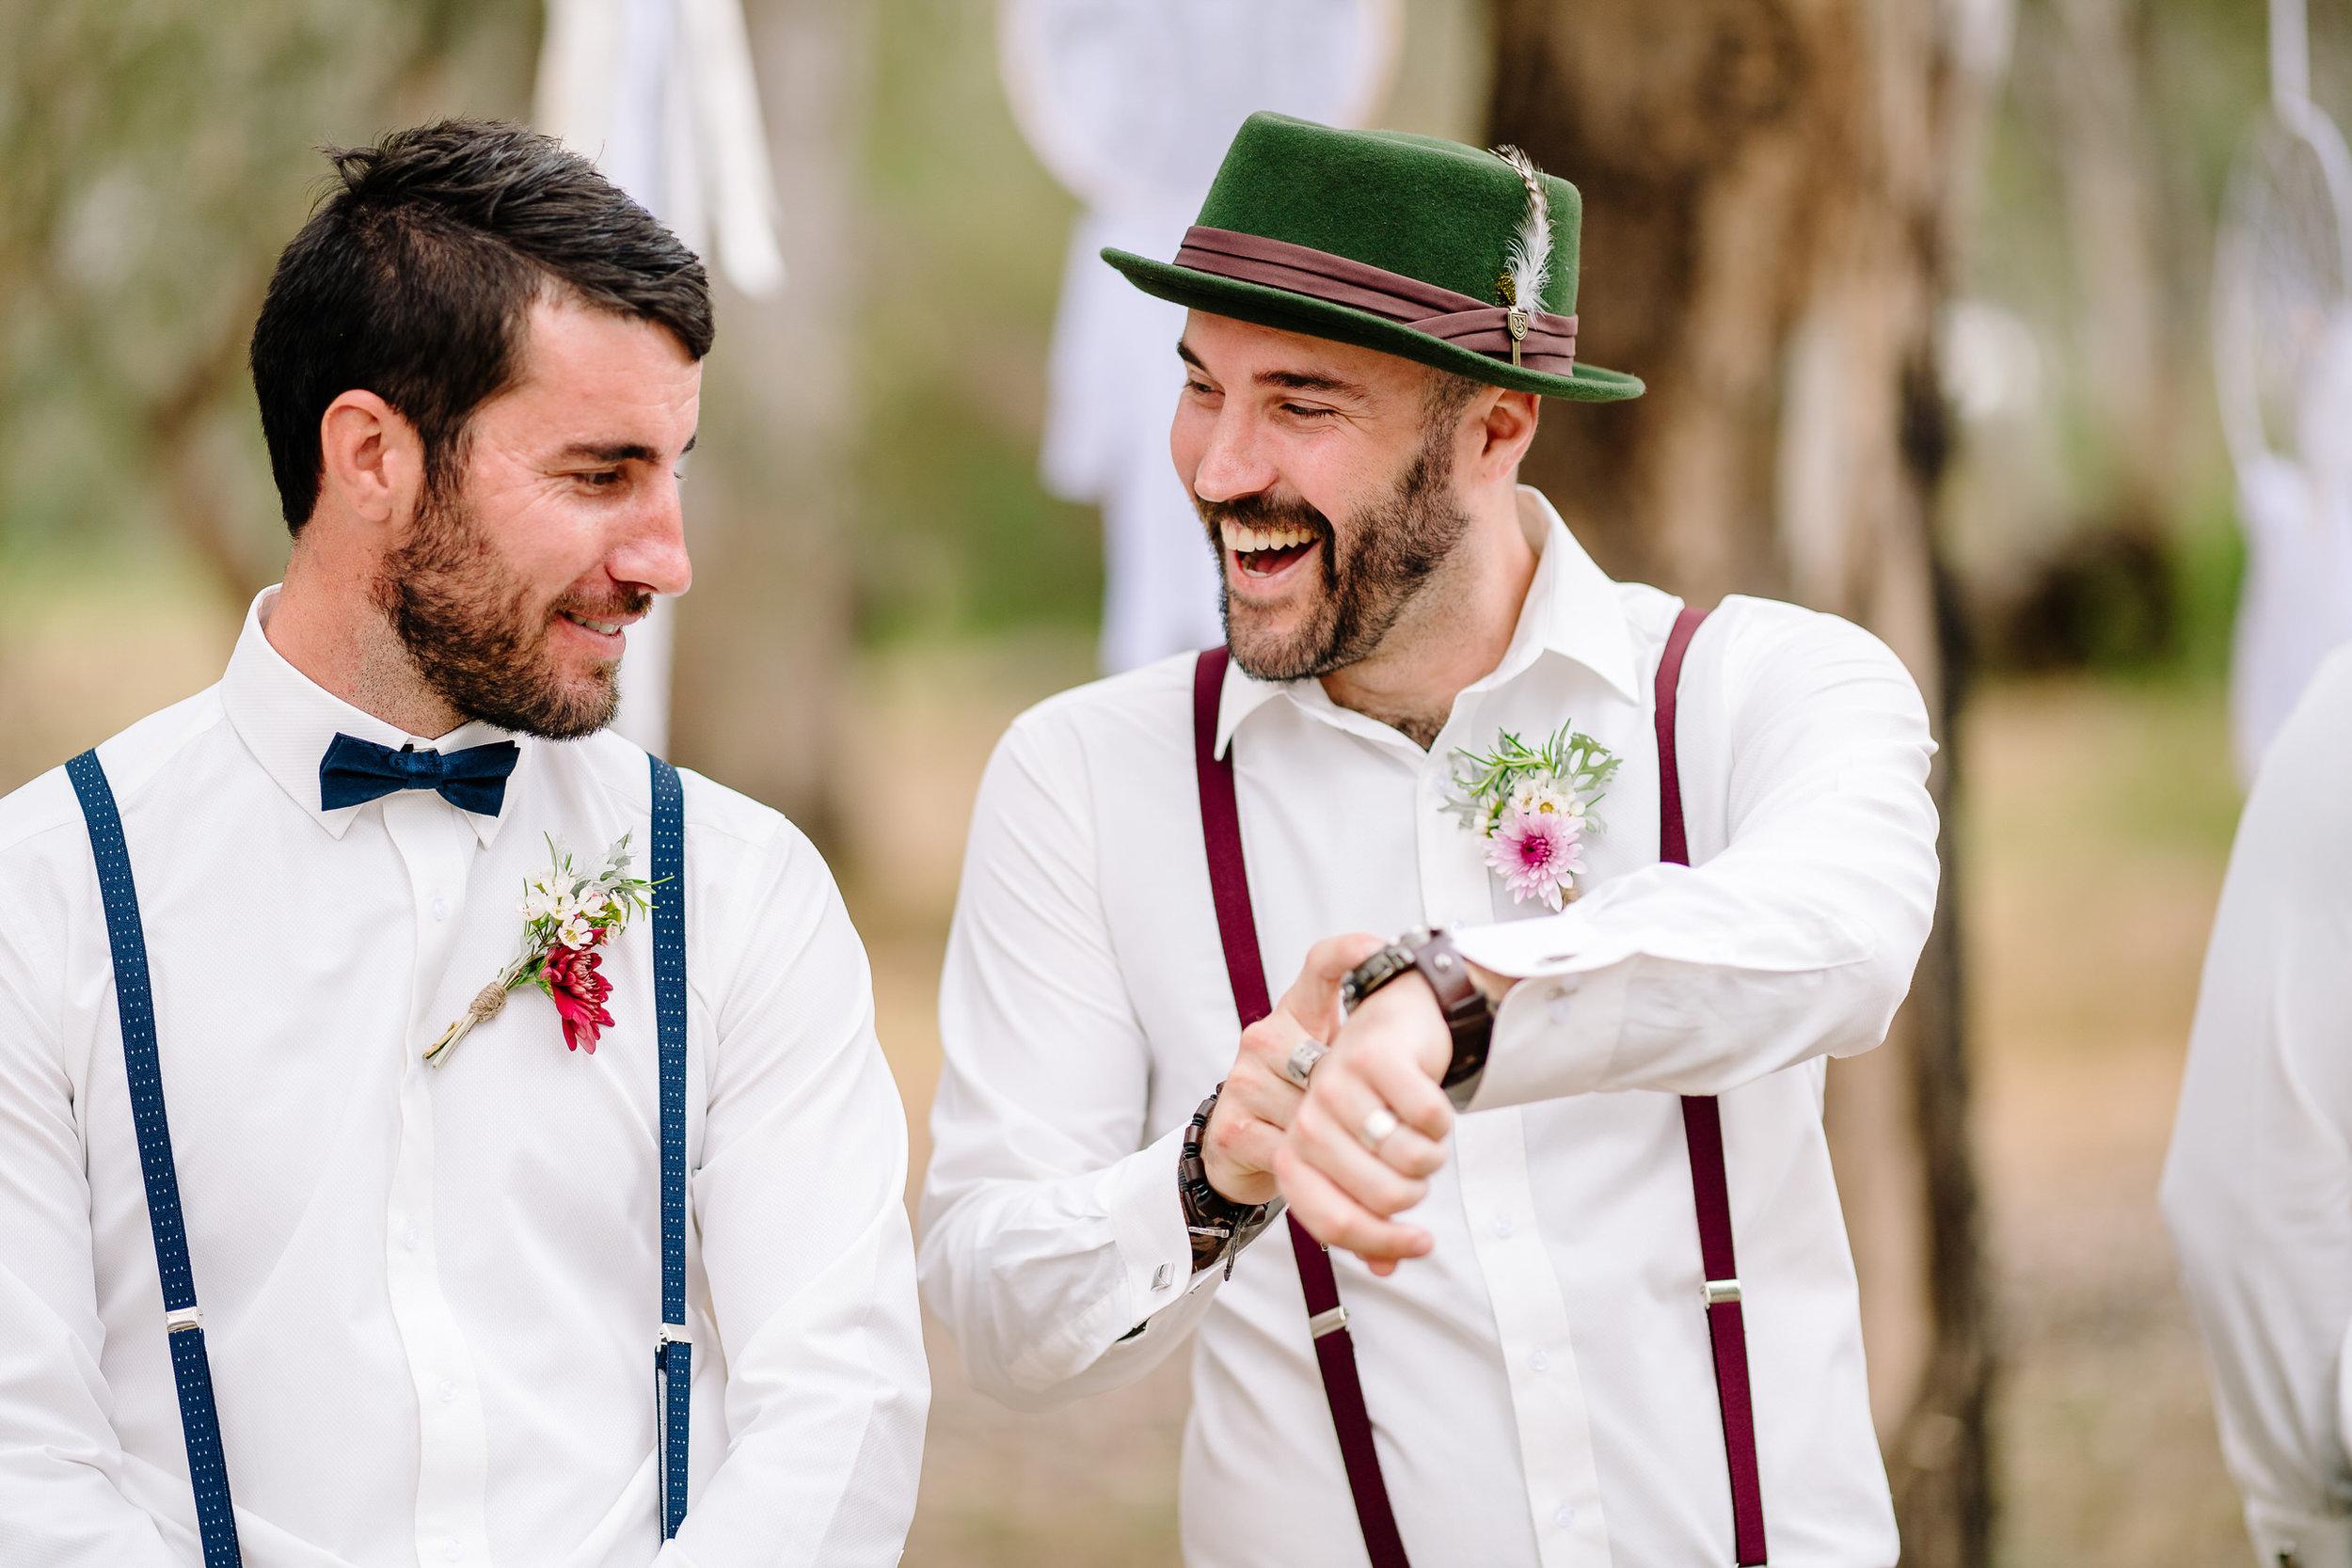 Justin_And_Jim_Photography_Backyard_Wedding160.JPG